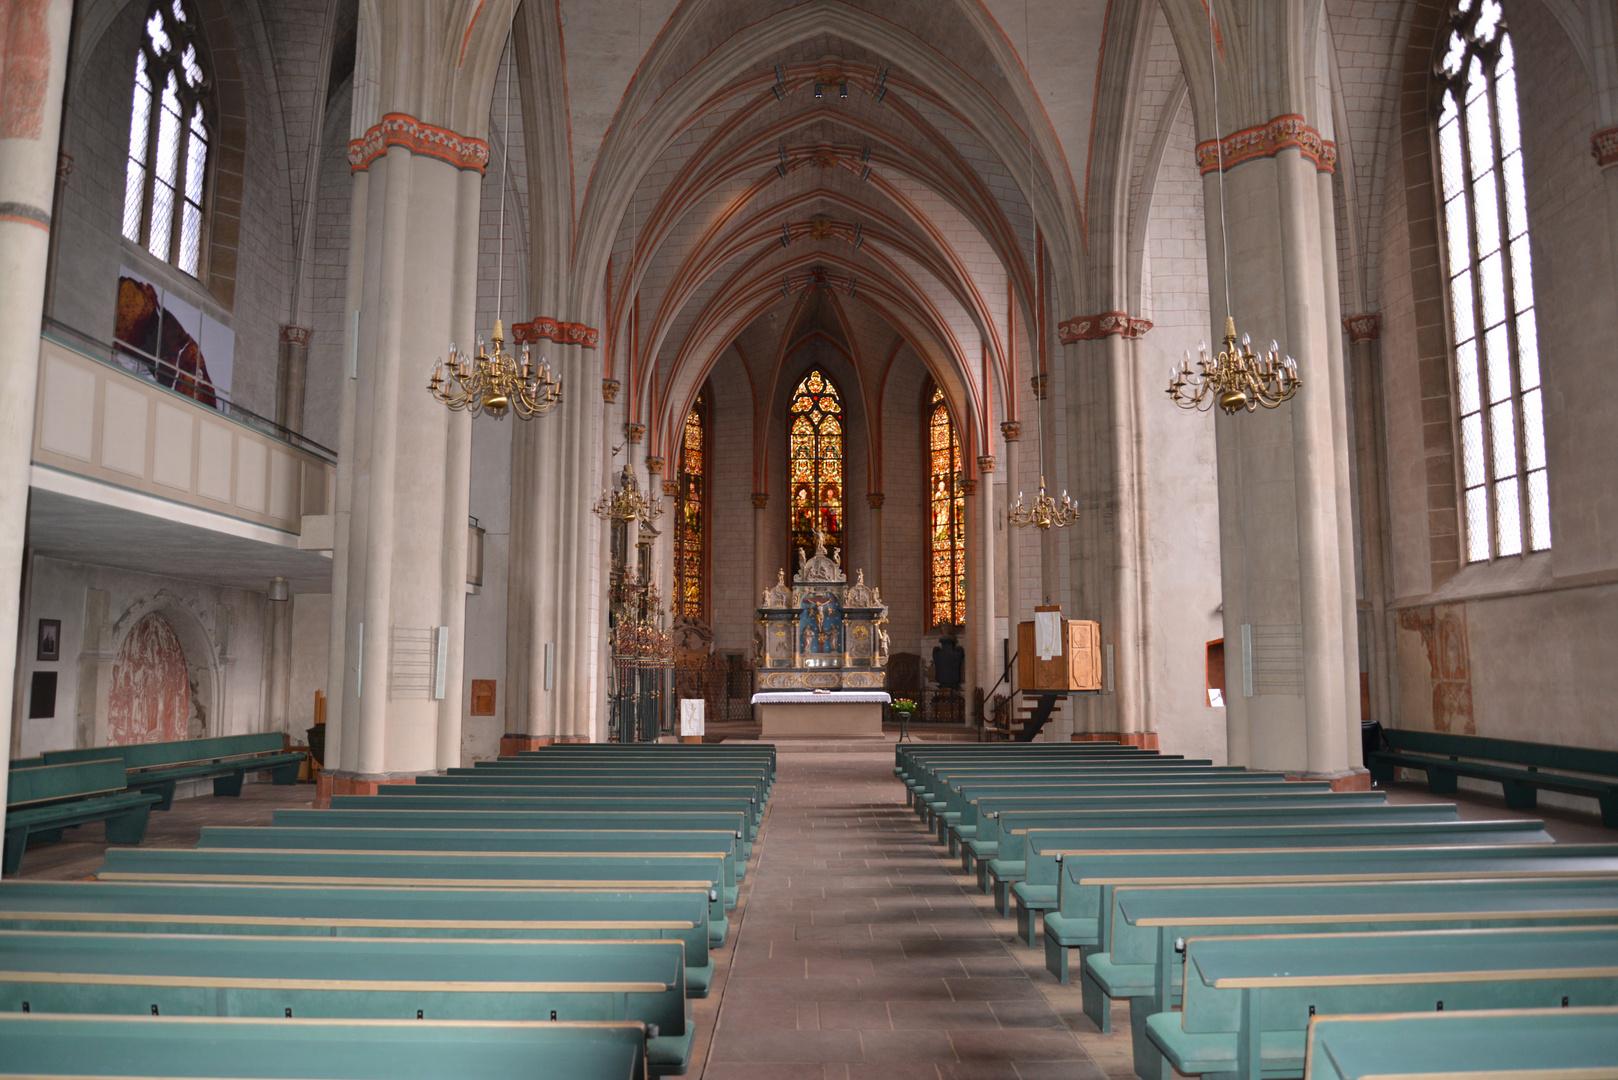 Luth. Pfarrkirche St. Marien